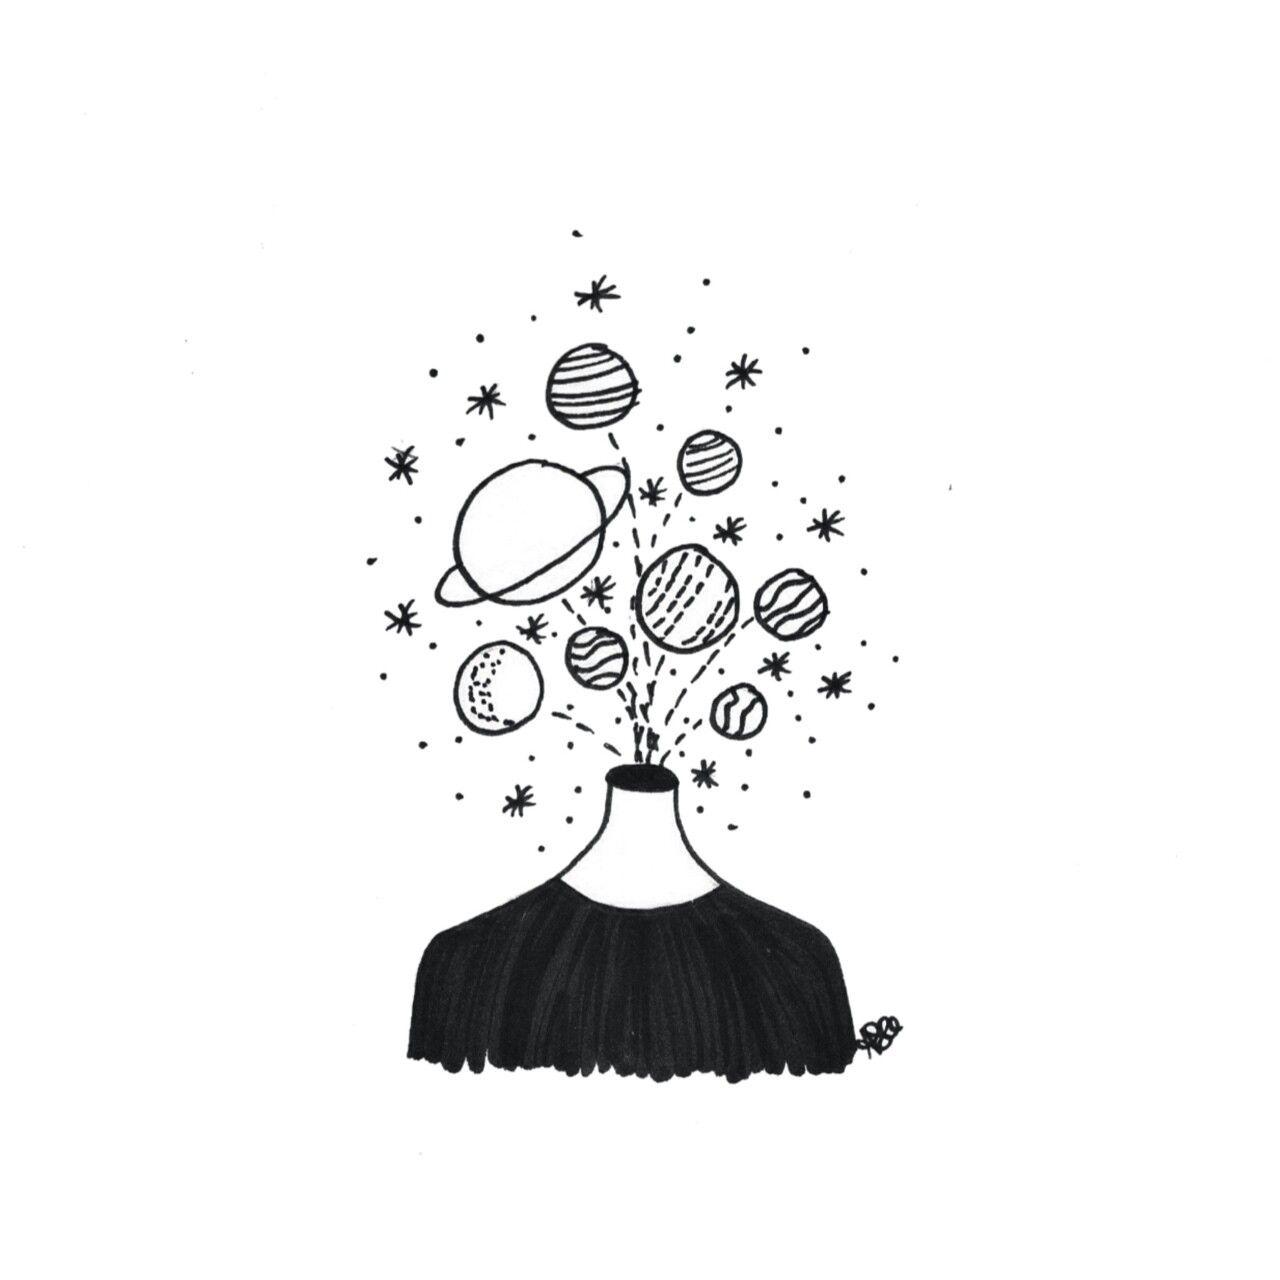 Pin By Cami On Cizim Tumblr Art Space Drawings Tumblr Drawings